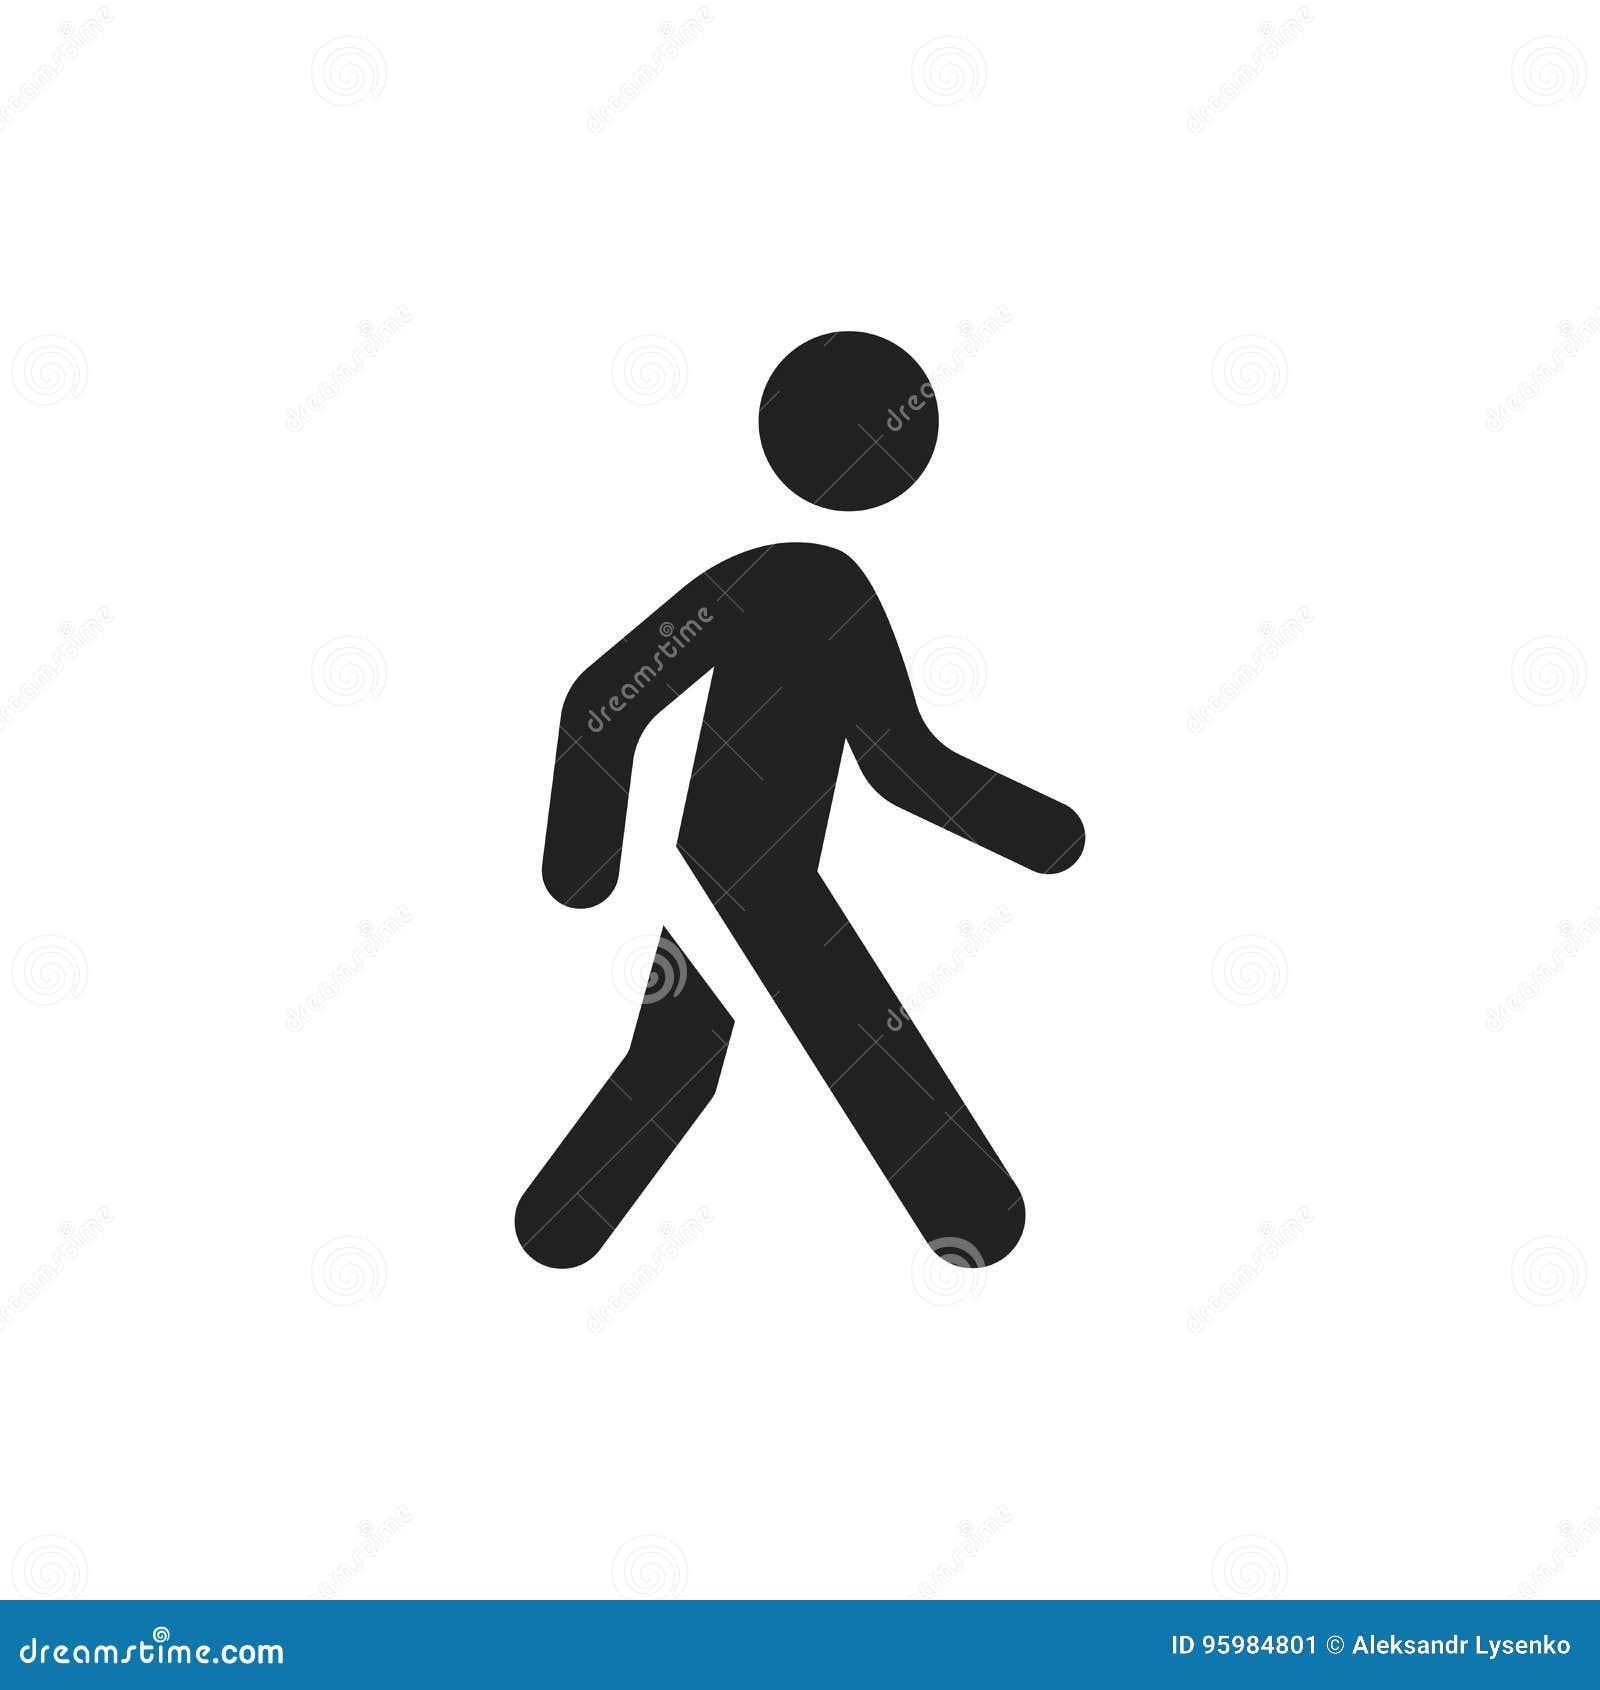 Walking man vector icon. People walk sign illustration